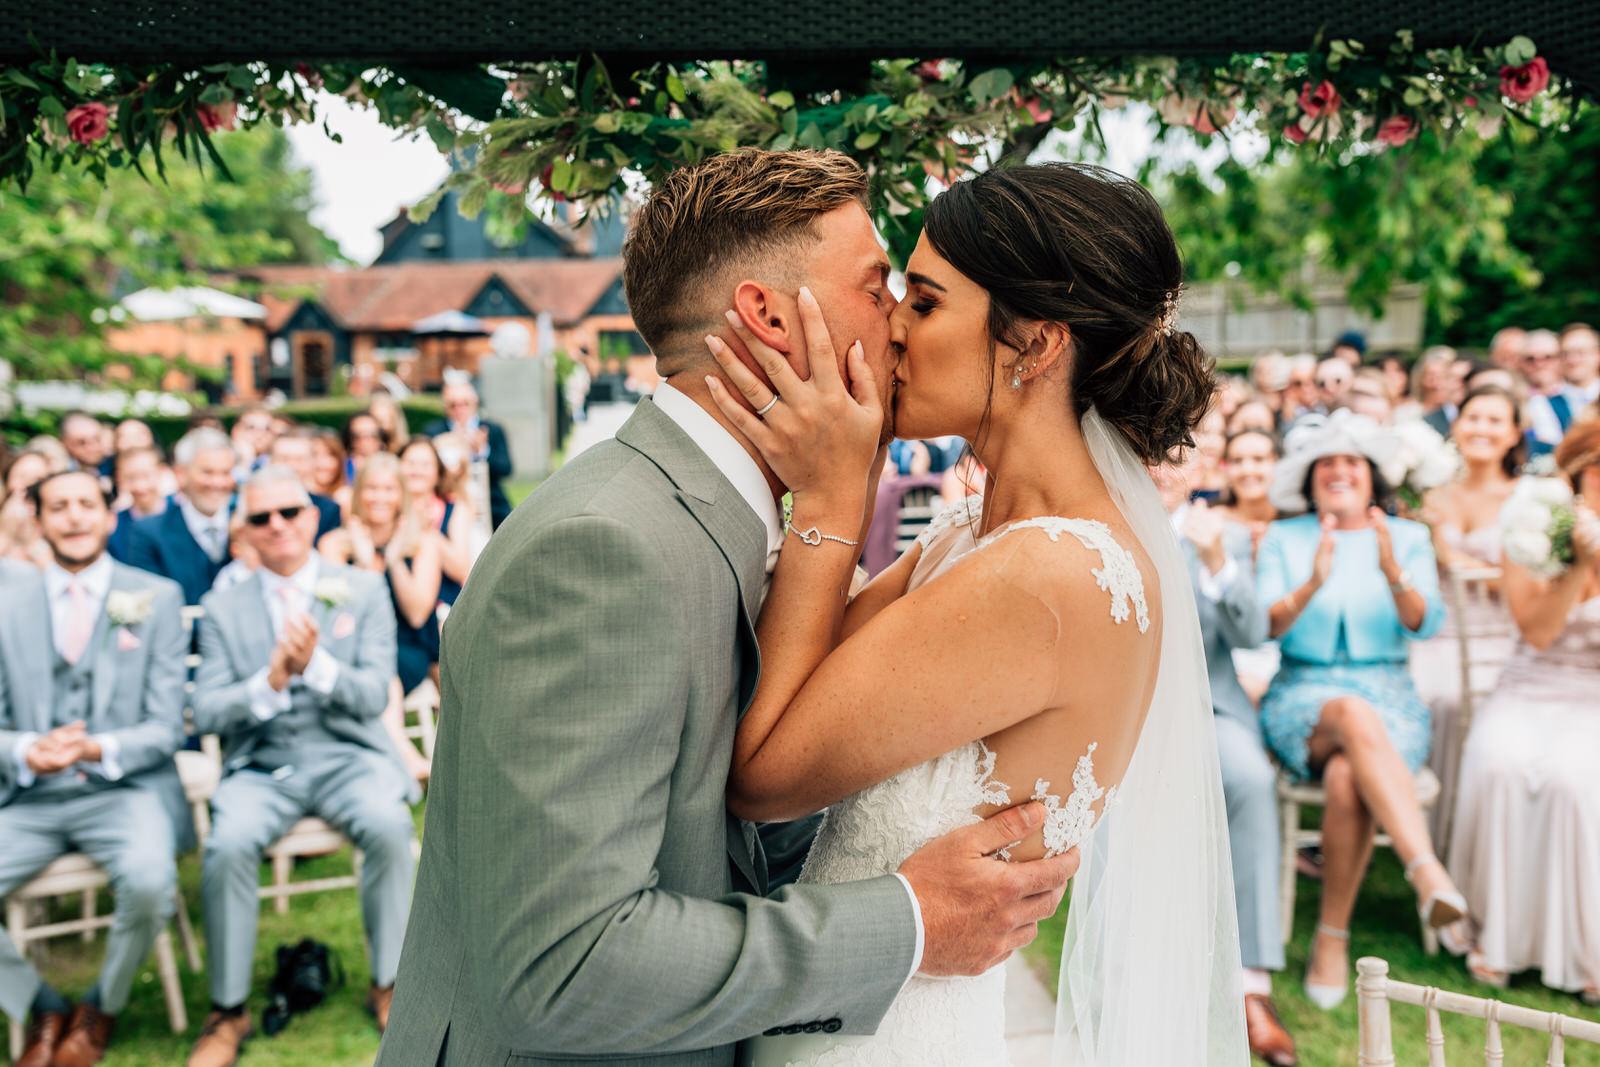 Home counties wedding photography by Damion Mower on English-Wedding.com (10)